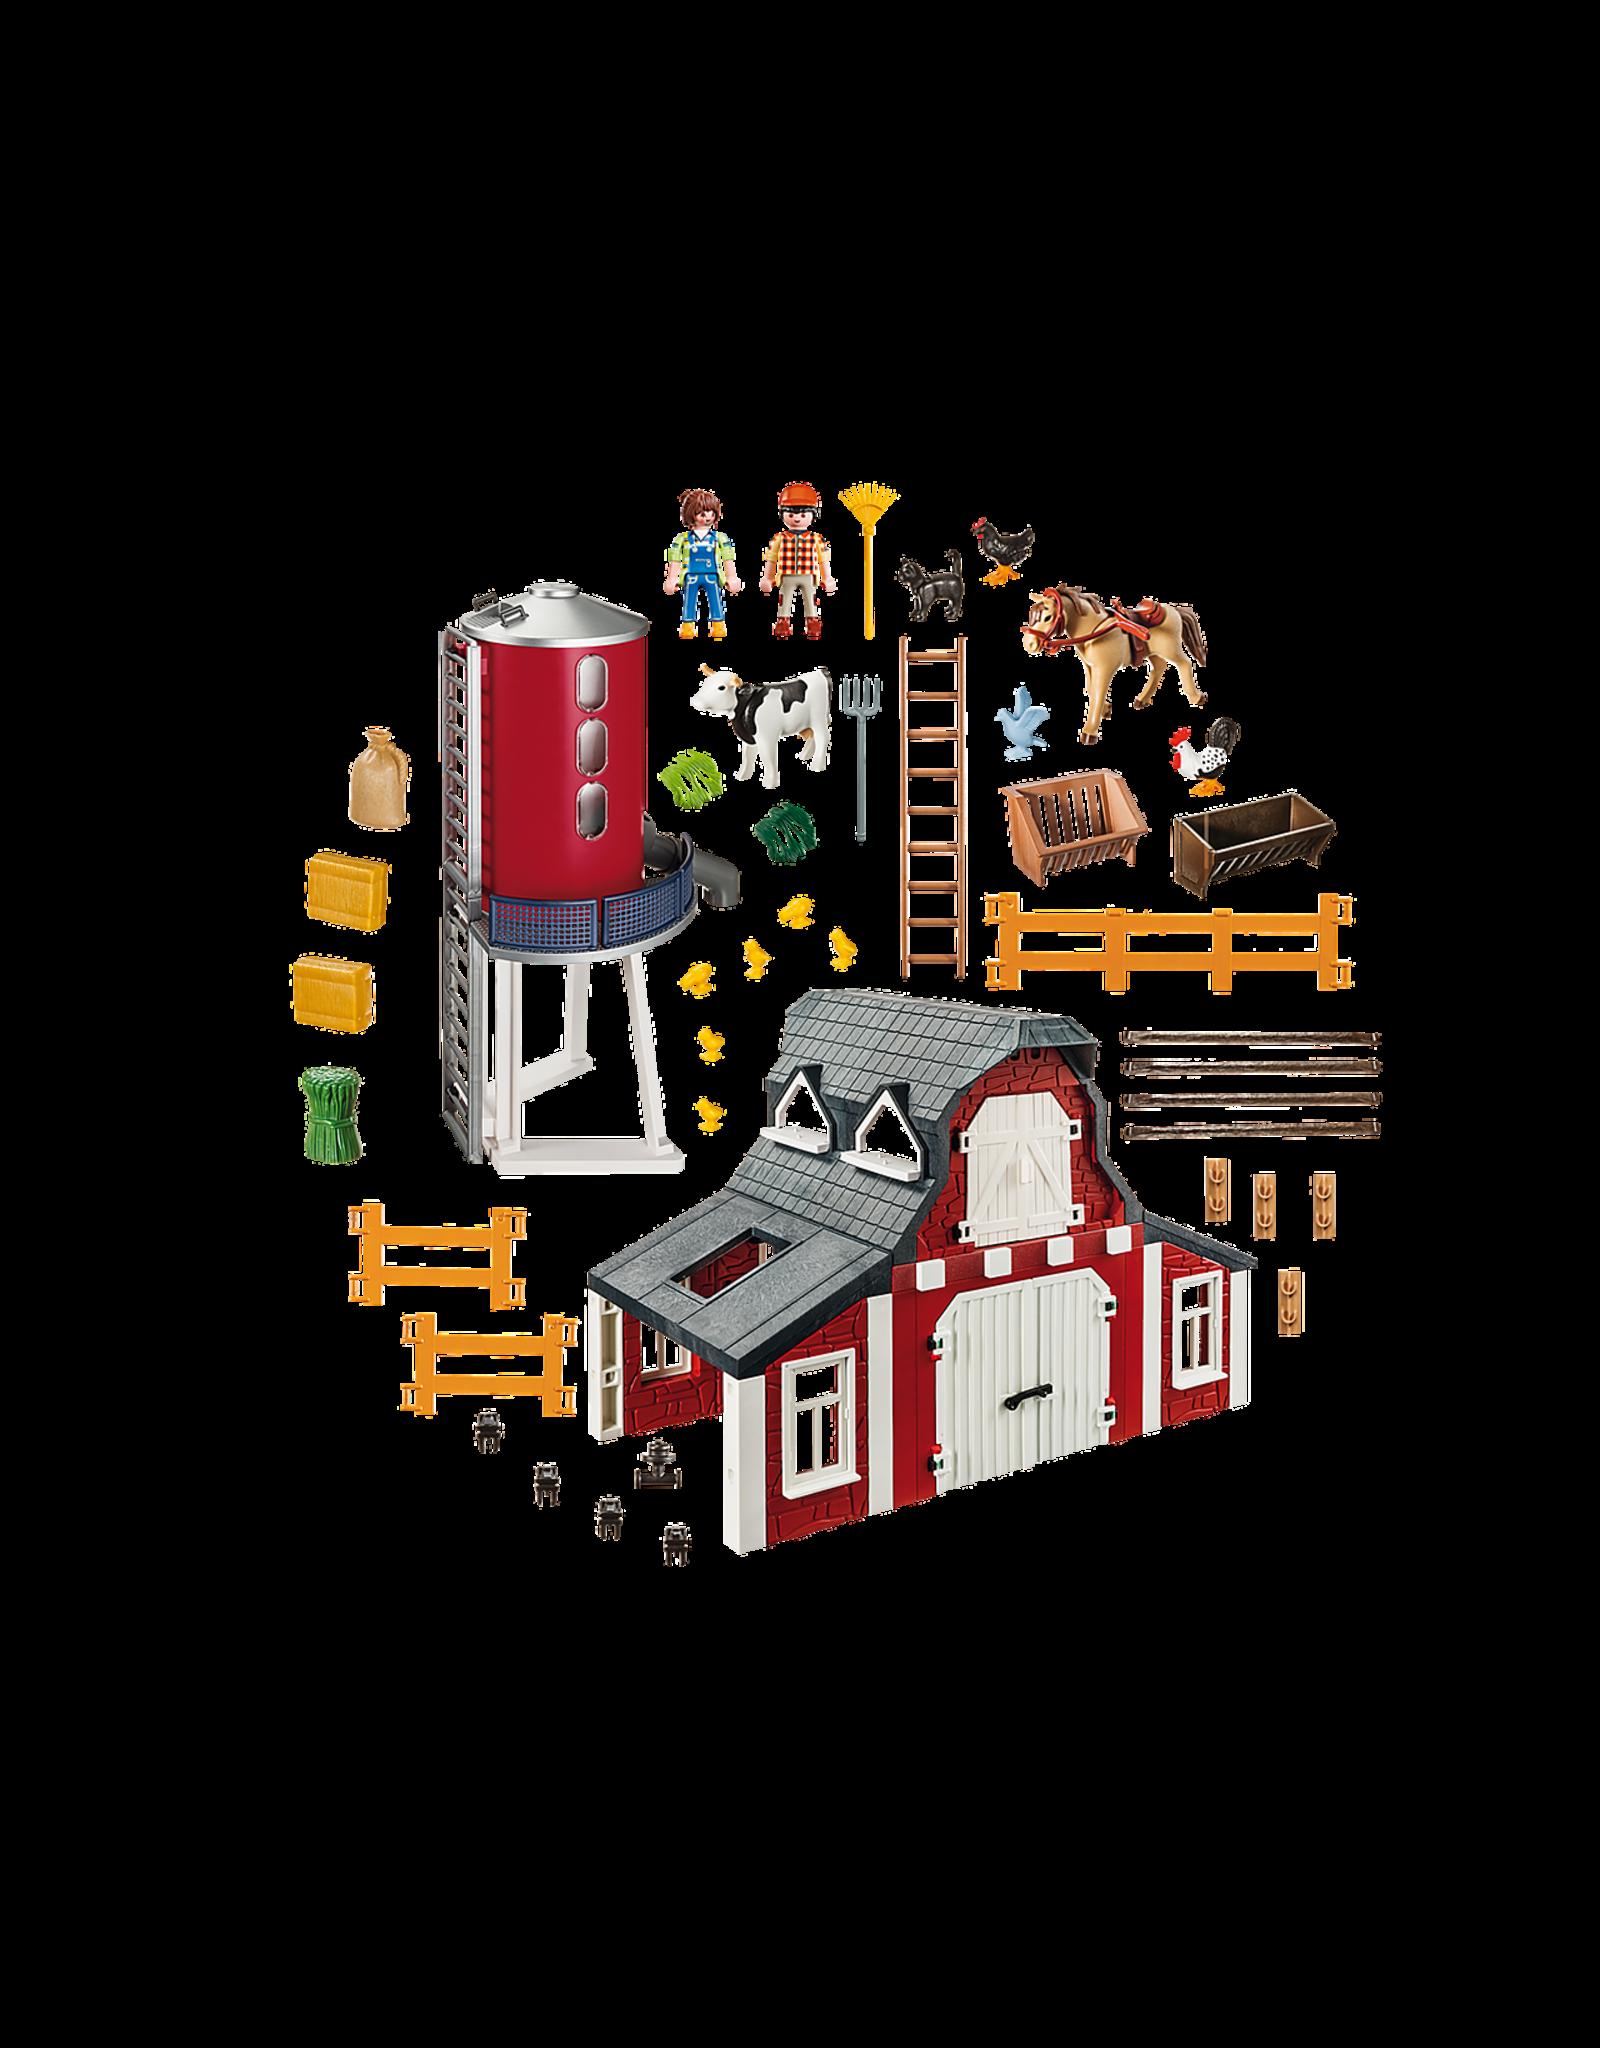 Playmobil Playmobil 9315 - Barn With Silo